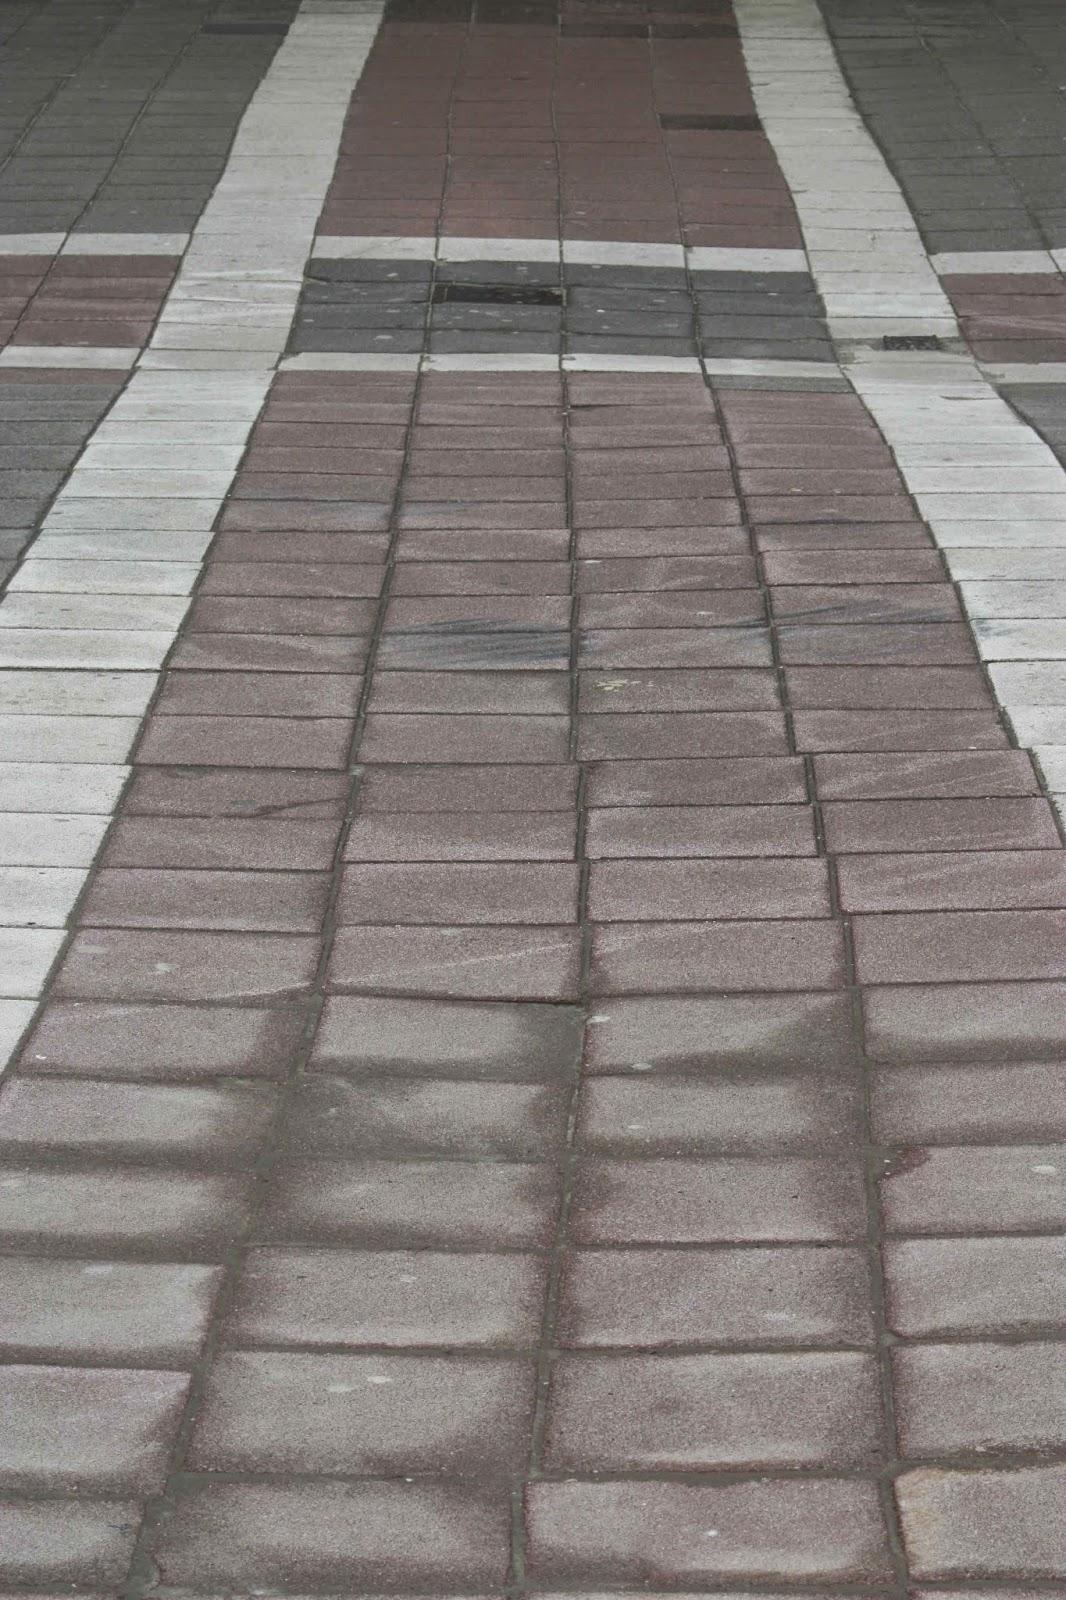 sidewalk with pattern